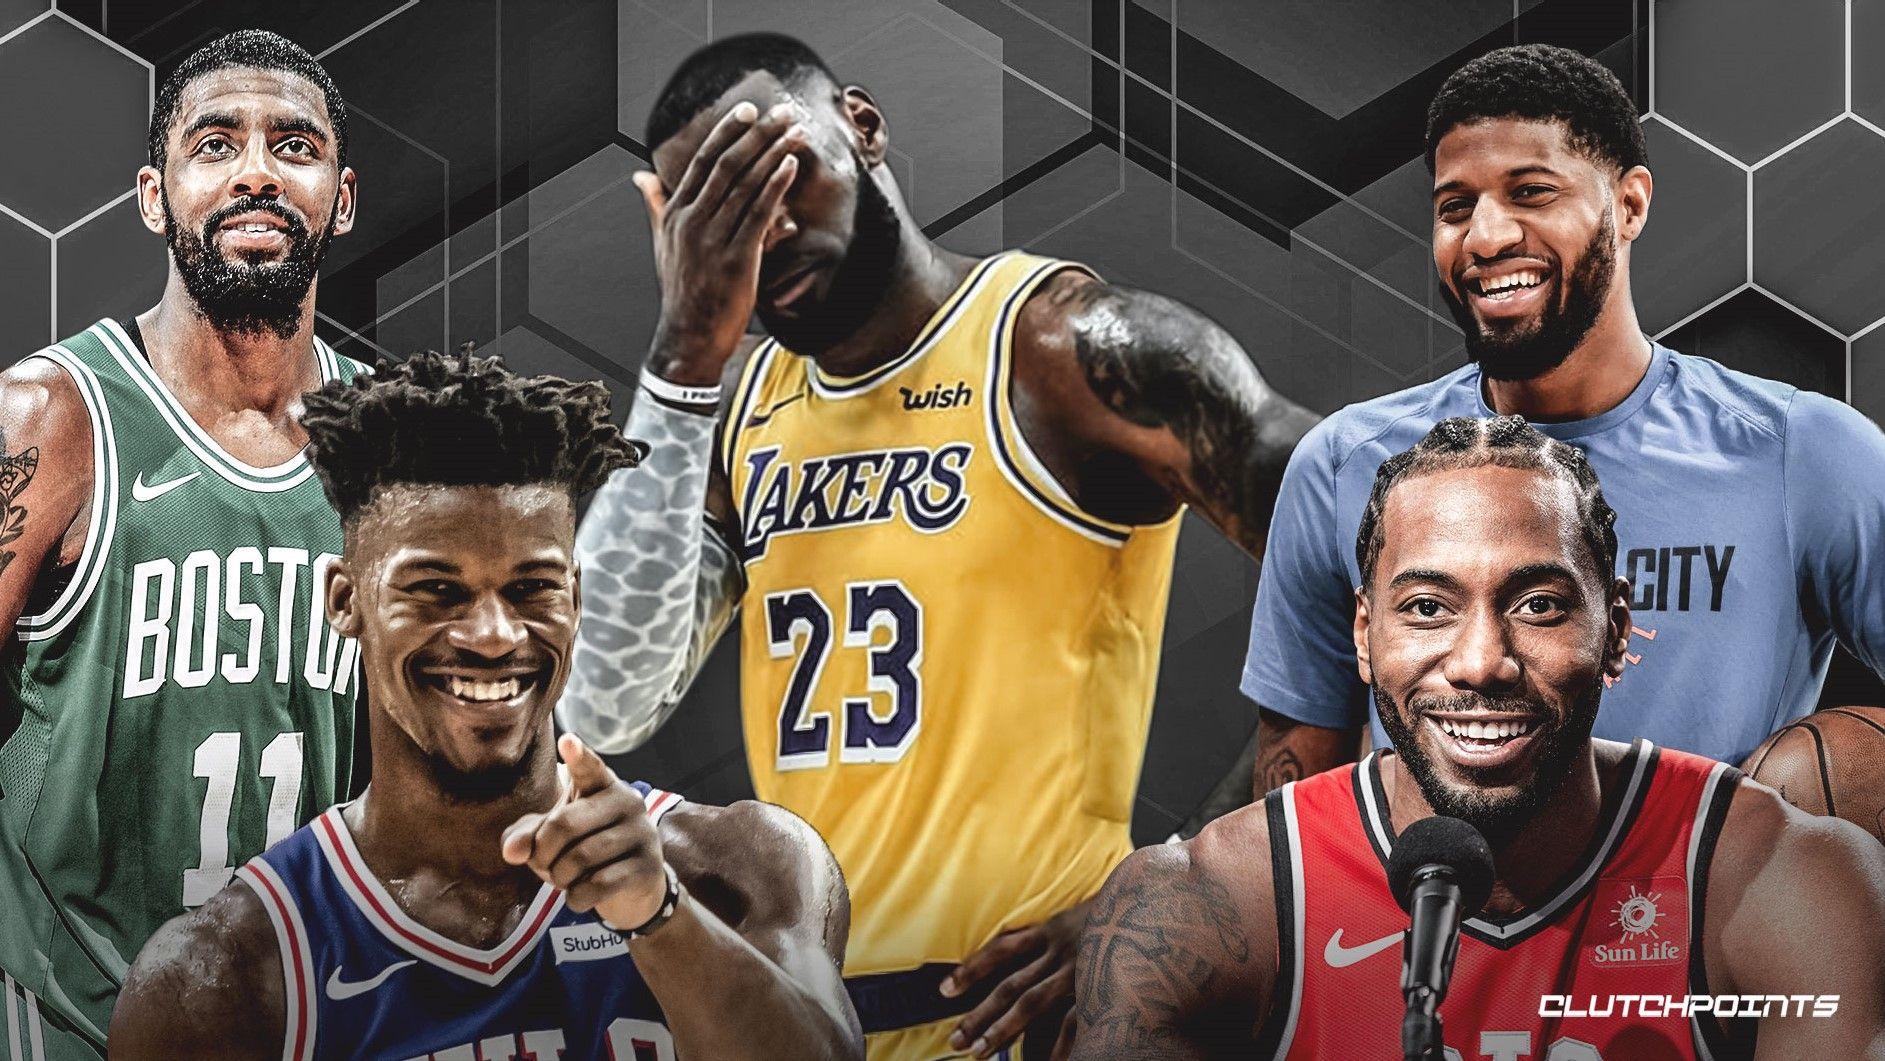 Nba Rivalries Lebron James And Anthony Davis Of Lakers Vs Kawhi Leonard And Paul George Of Clippers Lebron James Lakers Vs Anthony Davis